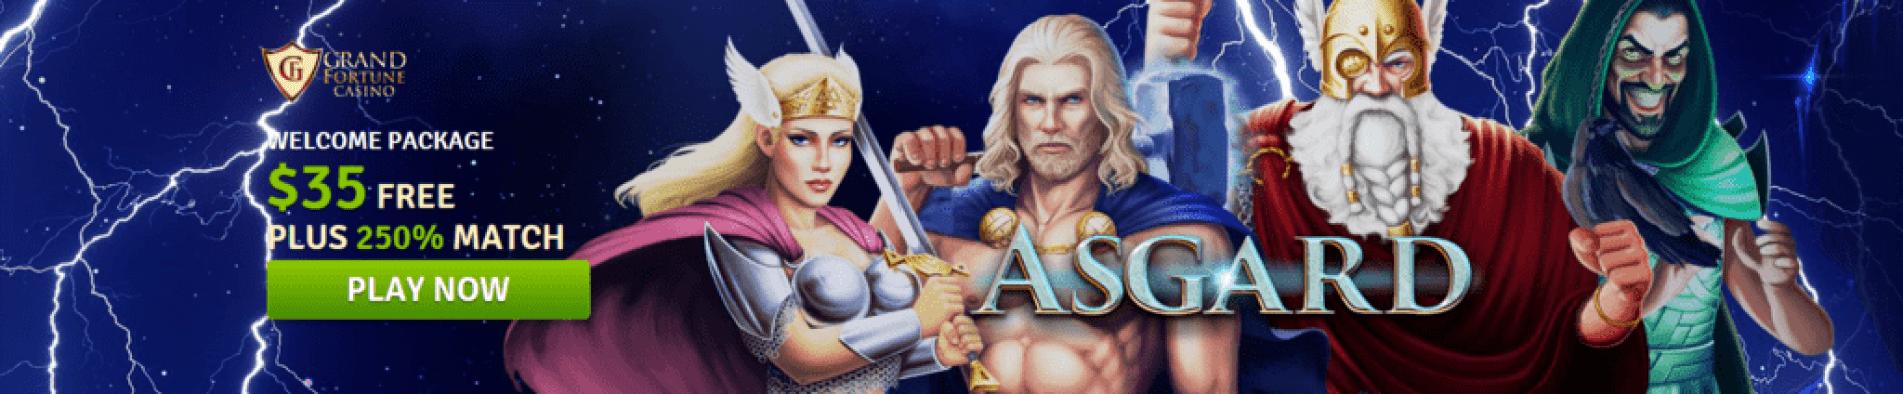 Grand Fortune Casino RTG New Game Asgard Latest 5-reel slot Asgard $35 No Deposit FREE Chip plus 250% Match Bonus